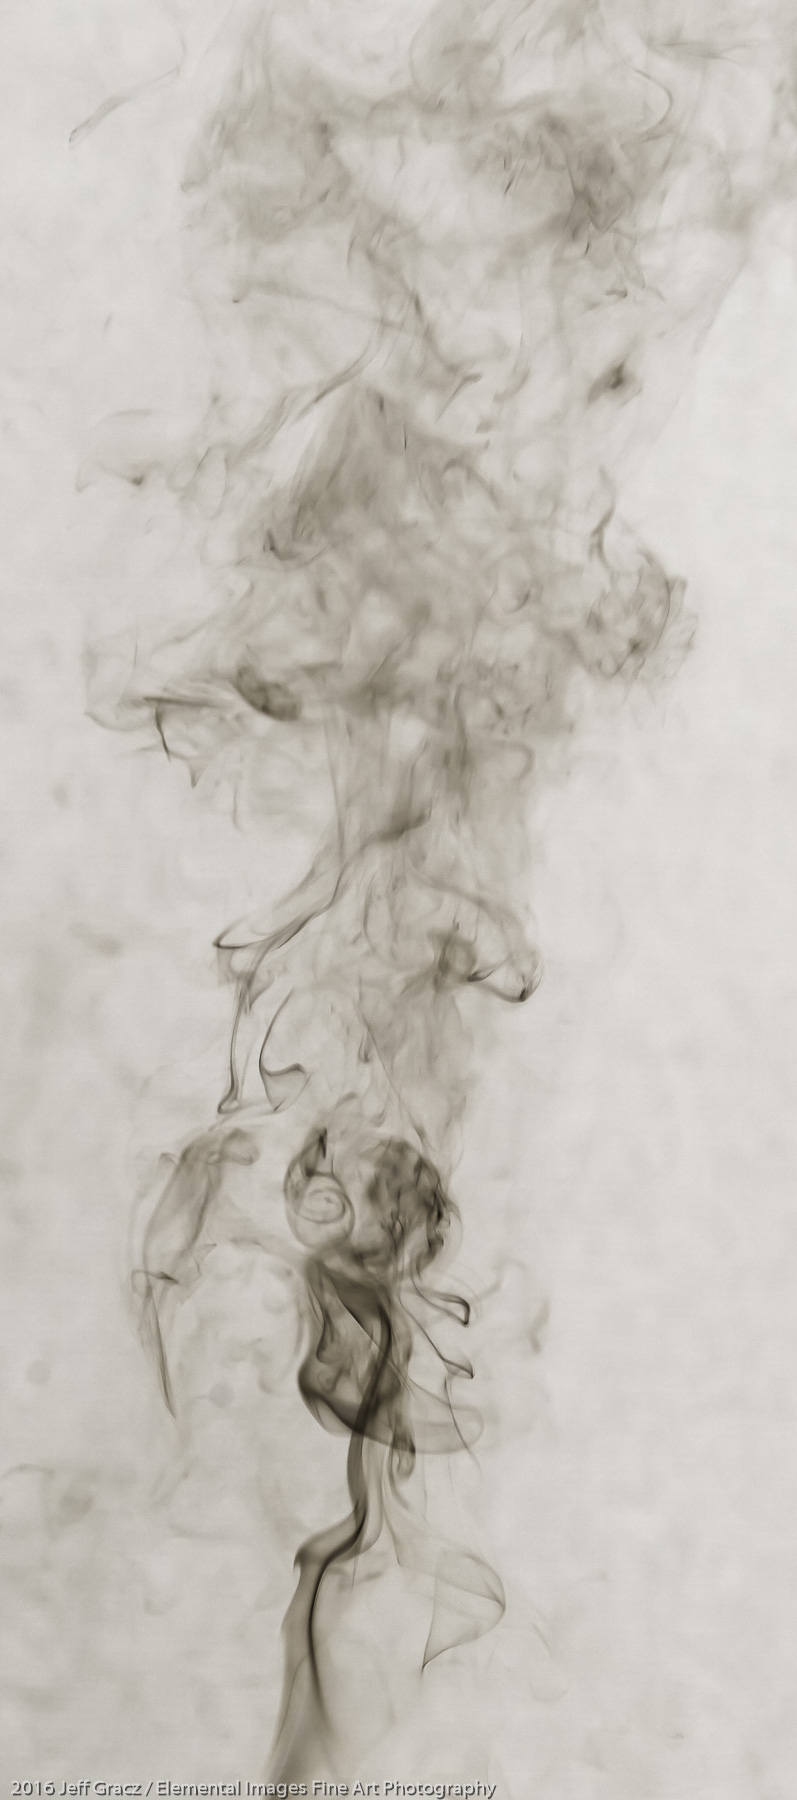 Smoke 4 | Vancouver | WA | USA - © 2016 Jeff Gracz / Elemental Images Fine Art Photography - All Rights Reserved Worldwide